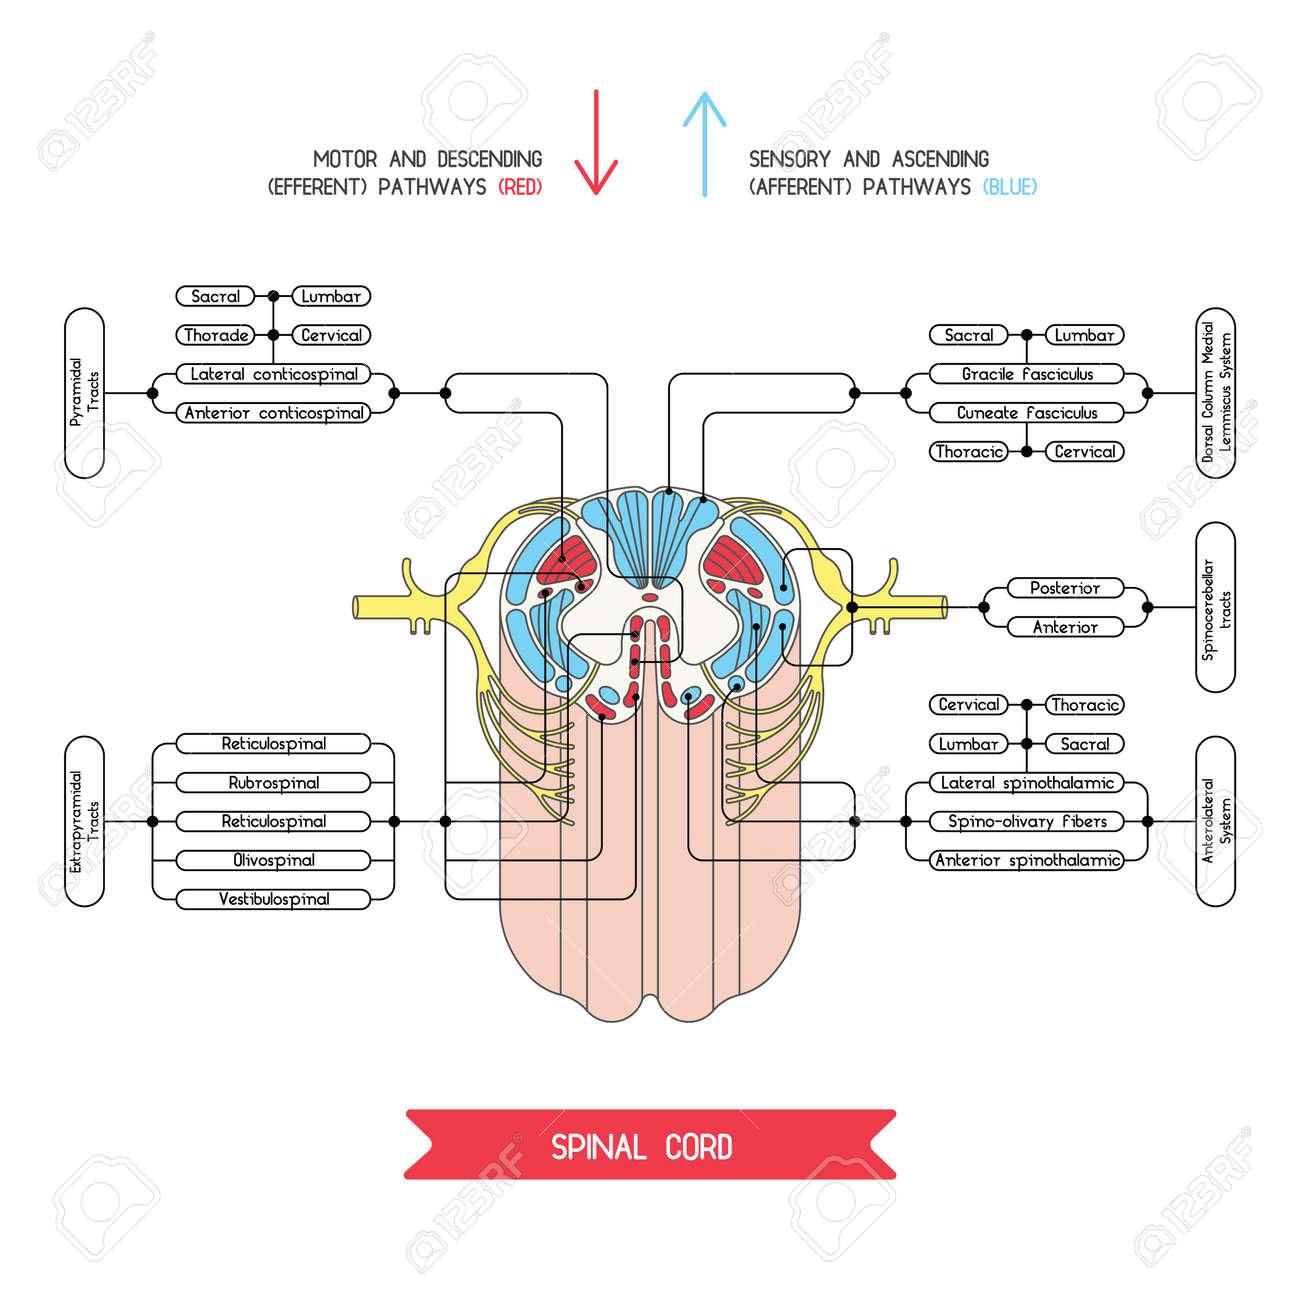 Berühmt Querschnitt Des Rückenmarks Anatomie Ideen - Menschliche ...